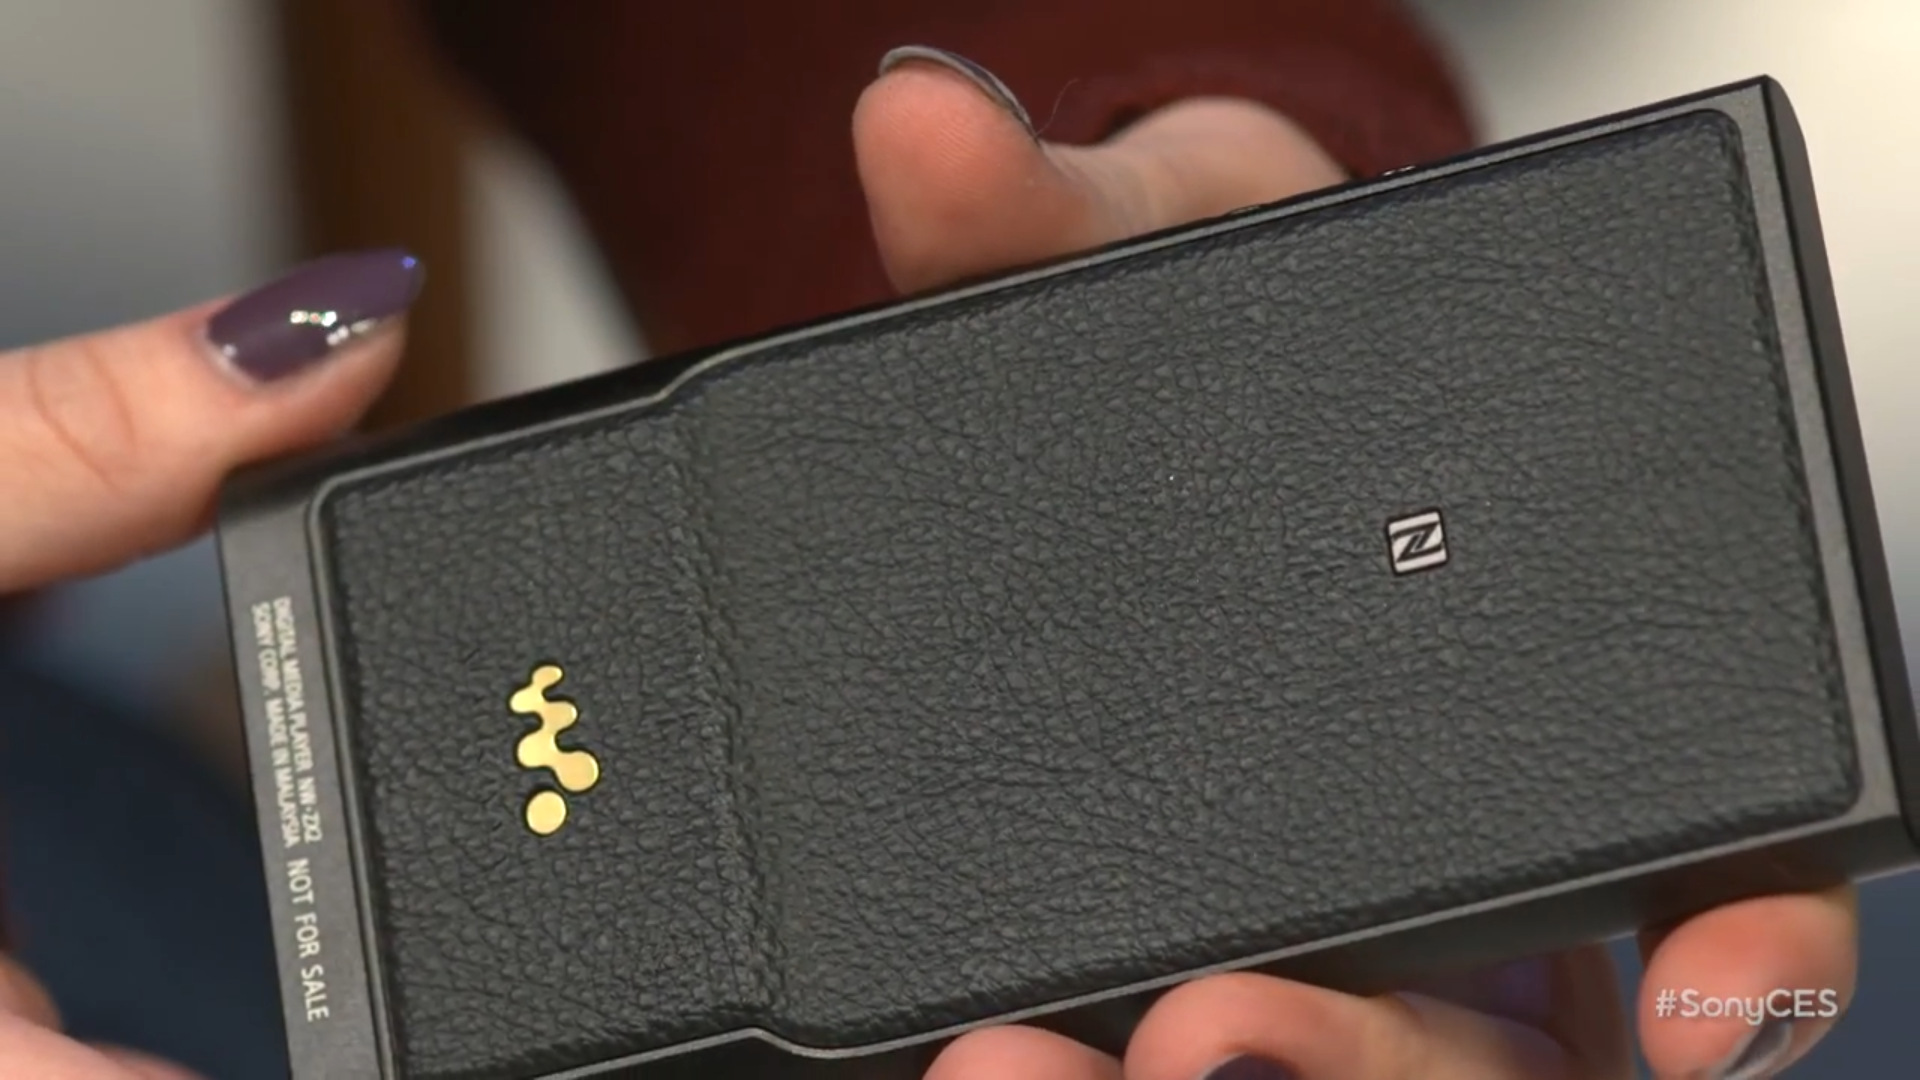 Sony CES Walkman TV Action Cam (8)